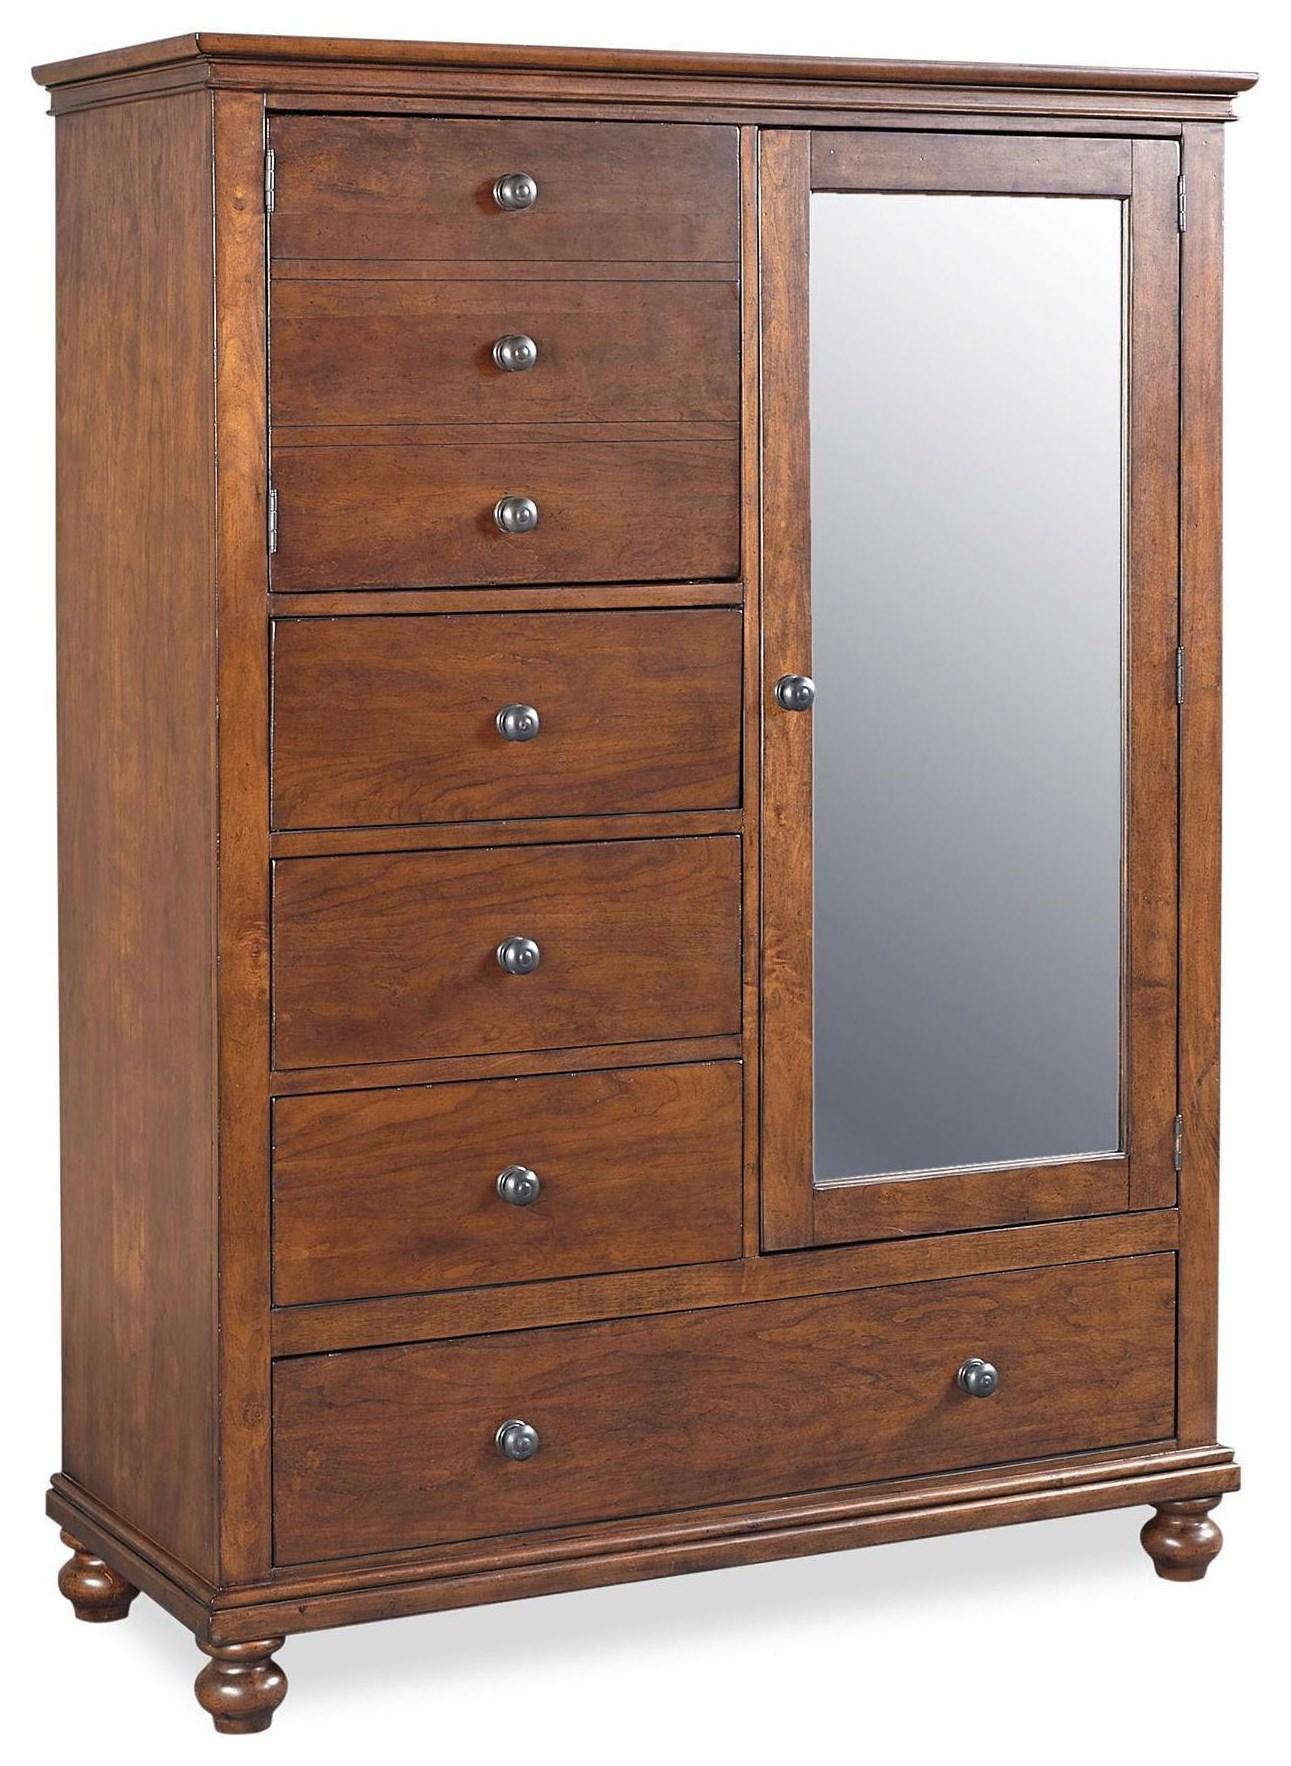 Oxford Chiffarobe by Aspenhome at HomeWorld Furniture